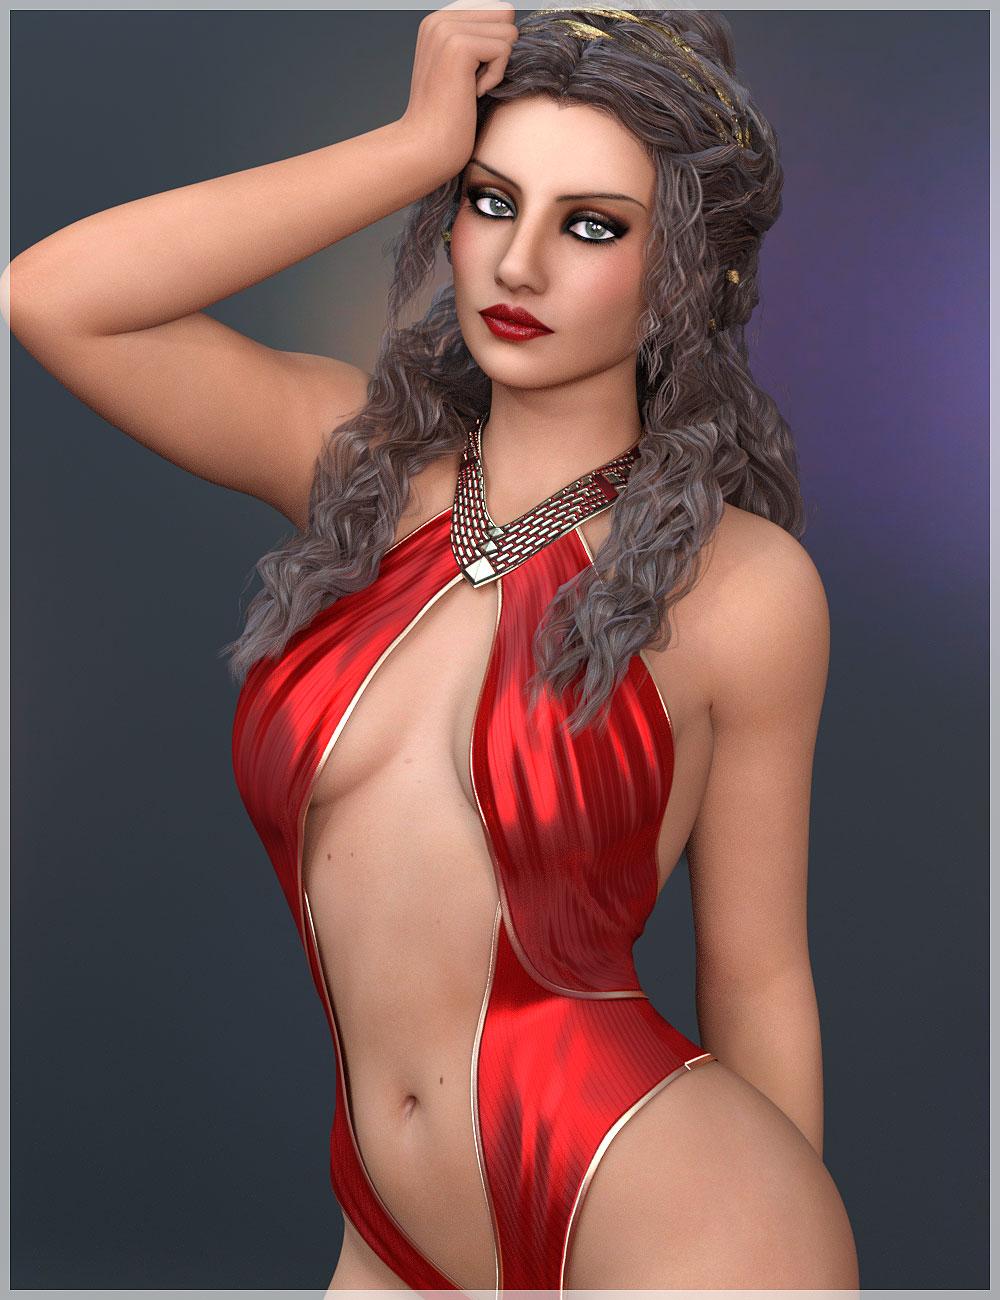 OZBD Niesha for Victoria 7 by: BelladzinesOziChick, 3D Models by Daz 3D